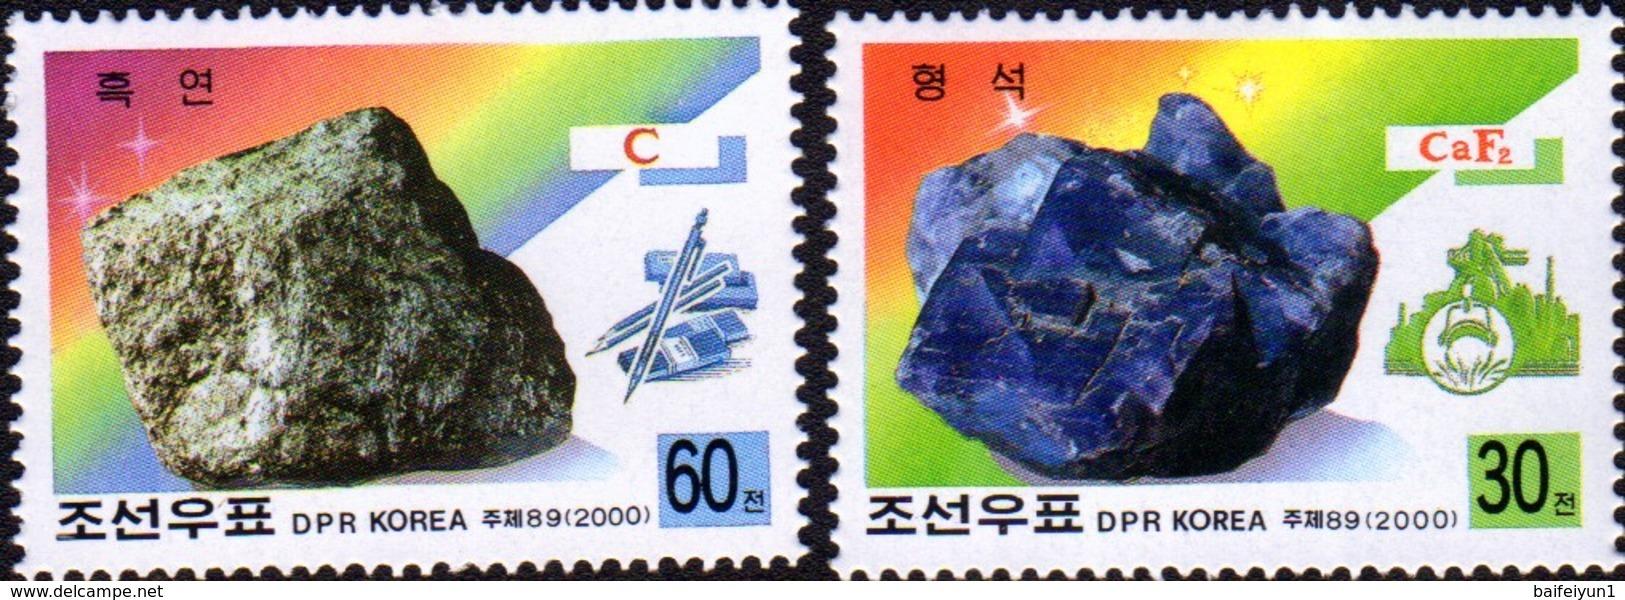 2000 North Korea Stamps Mineral Graphite And Fluorite 2v - Minerals